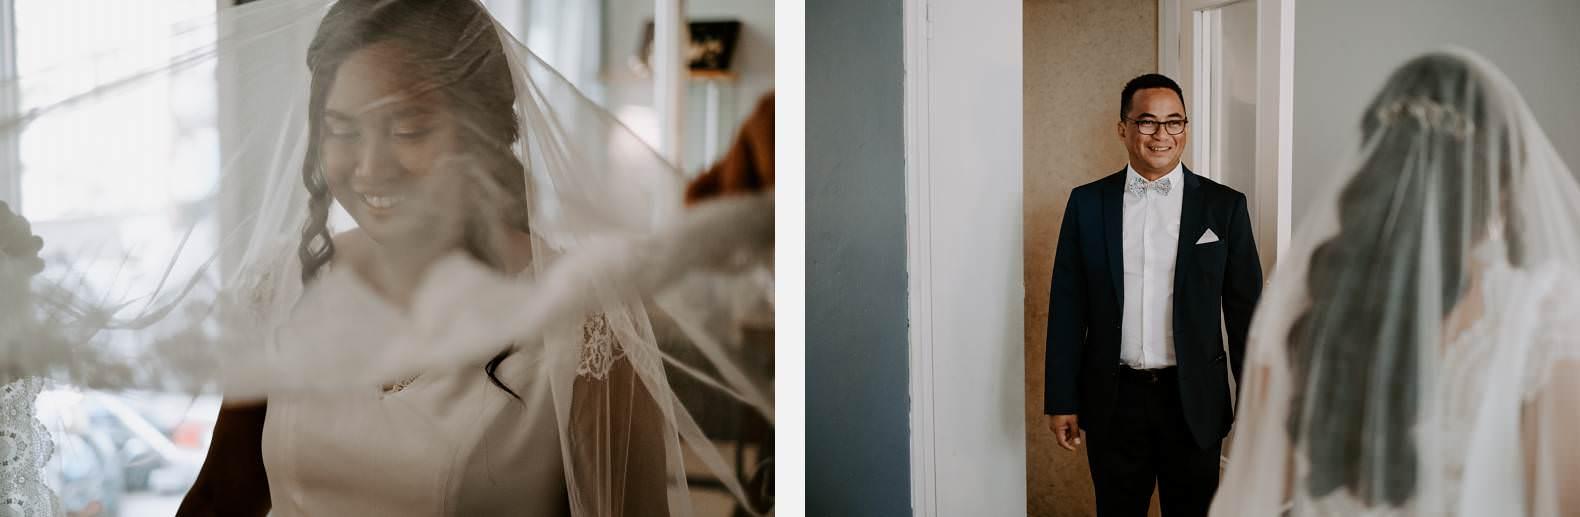 mariage manoir de corny photographe bel esprit 0007 1